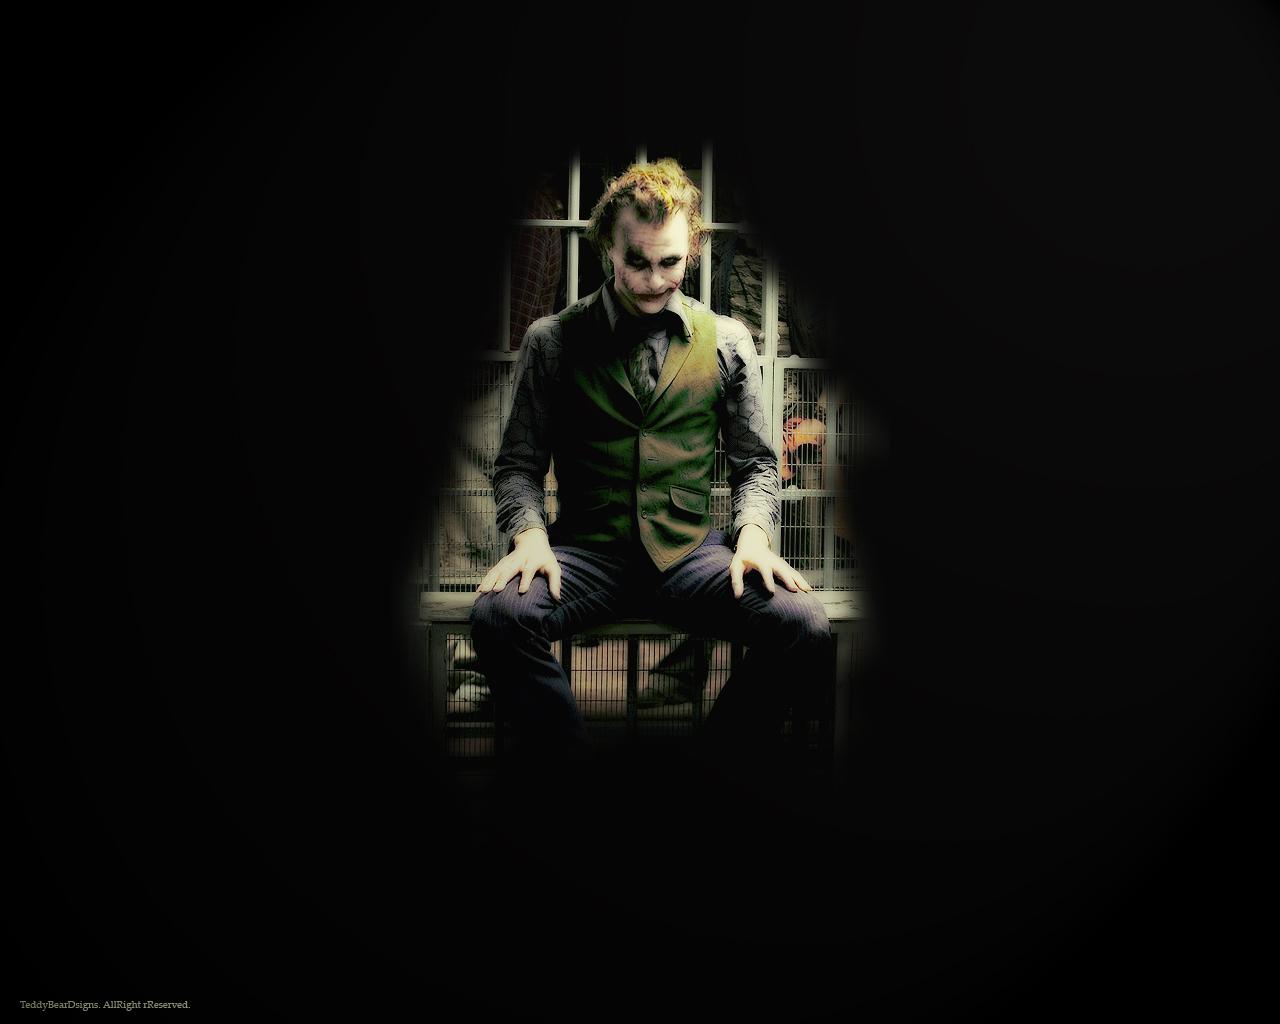 14119 download wallpaper Cinema, People, Batman, Joker screensavers and pictures for free